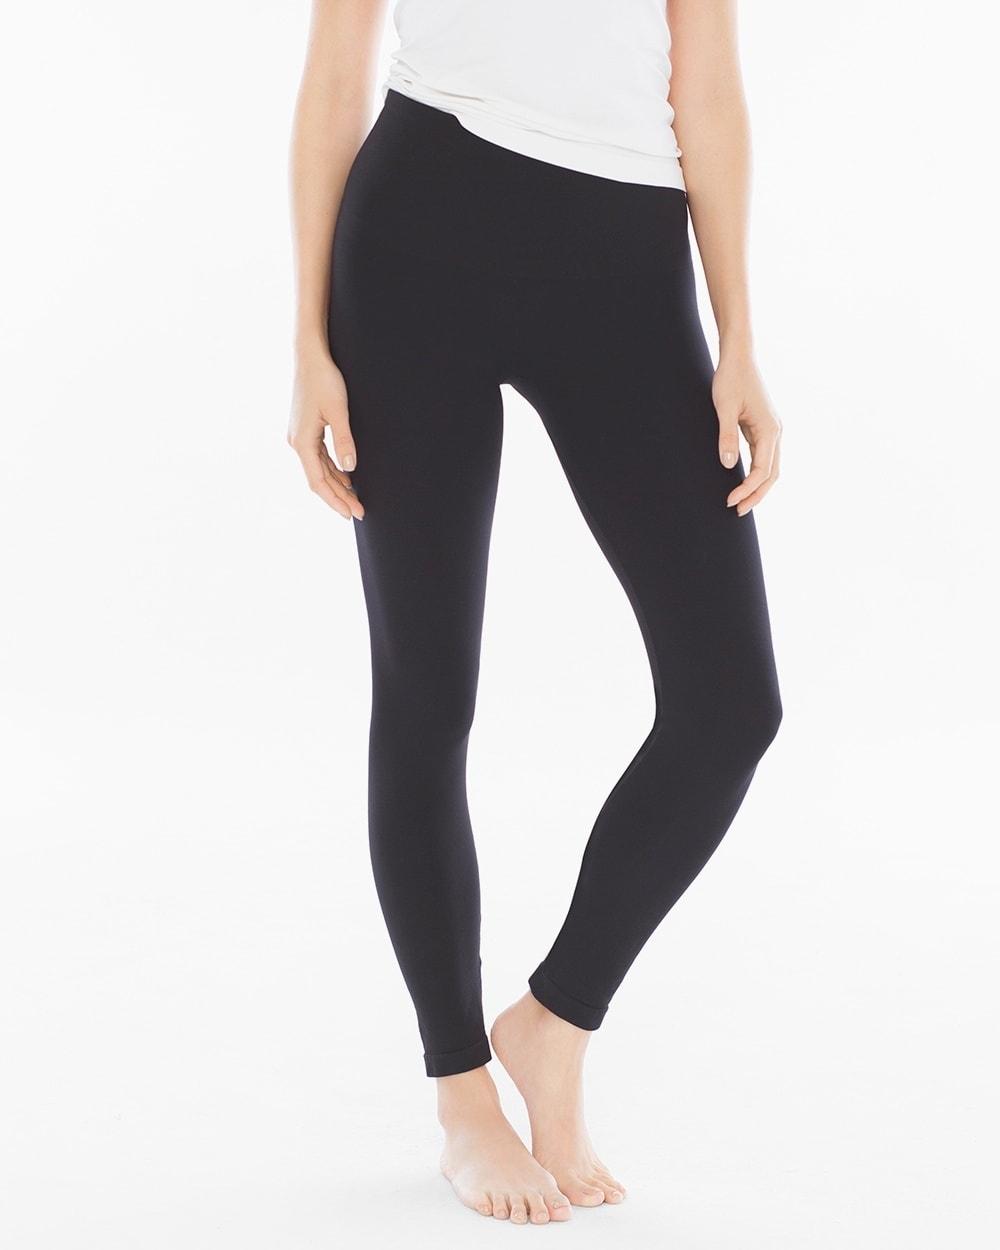 Black Perfect Pant Slimming Legging by Soma Intimates